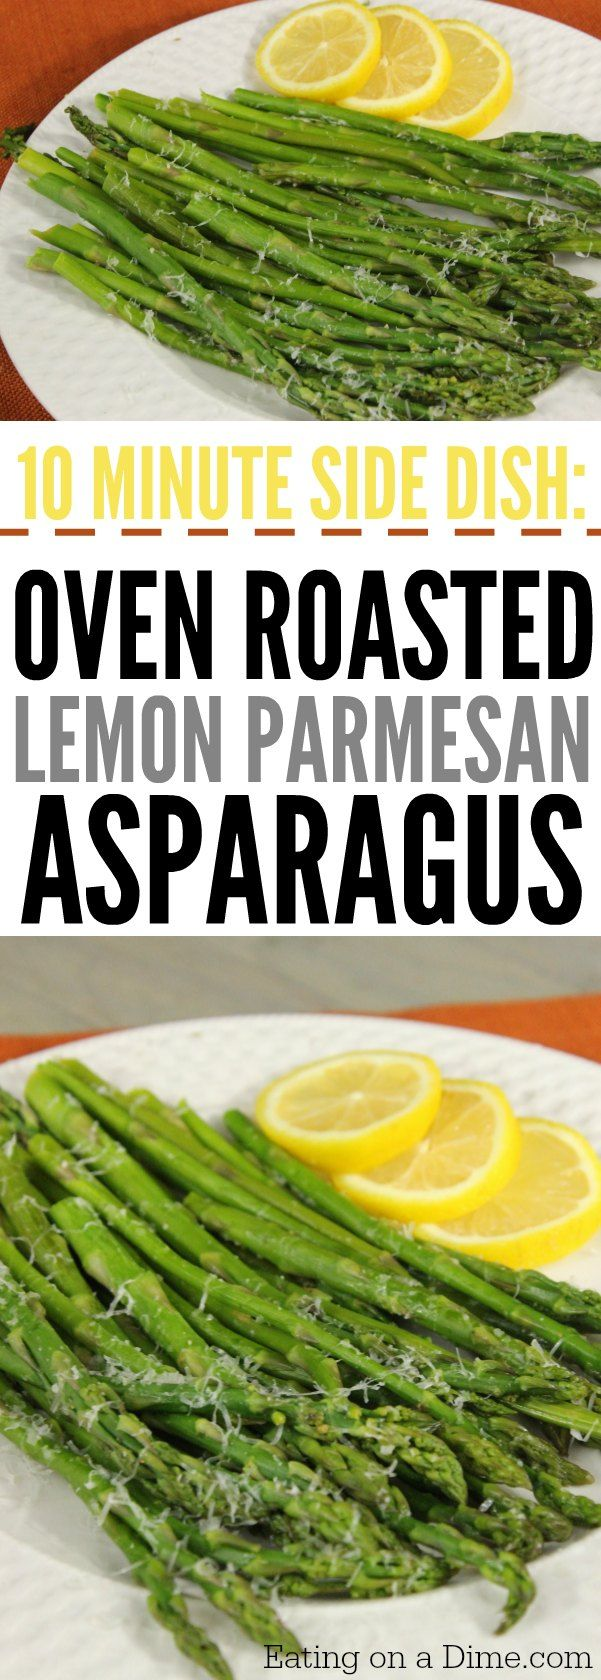 Best 25+ Parmesan Asparagus Ideas On Pinterest  Roasted Asparagus  Parmesan, Asparagus Dishes And Asparagus Ideas